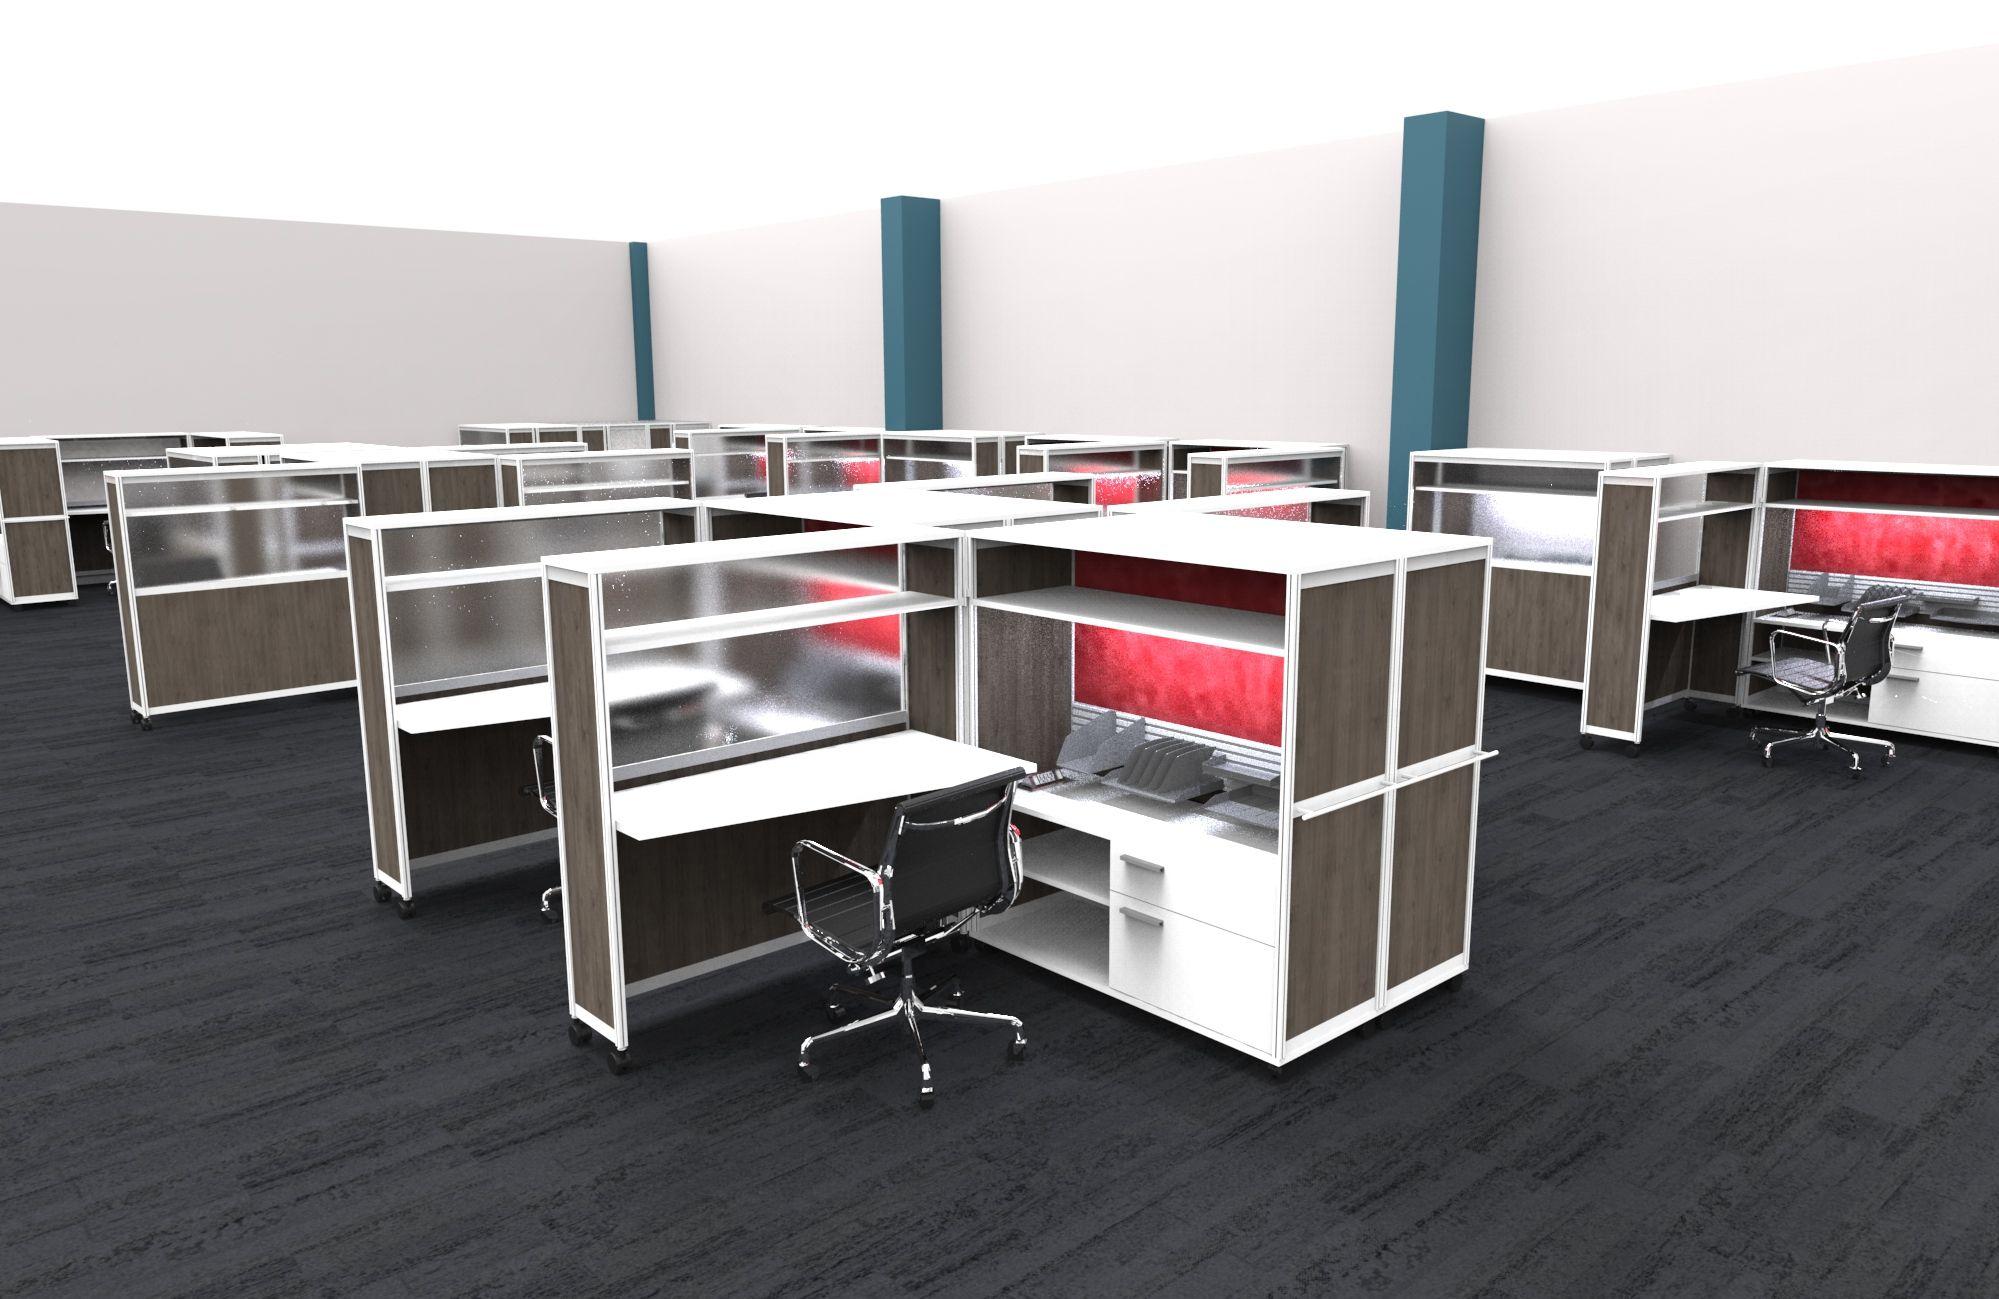 office cubicle desks. Bob Mobile Computer Cubicle Desk With Privacy Walls Office Desks